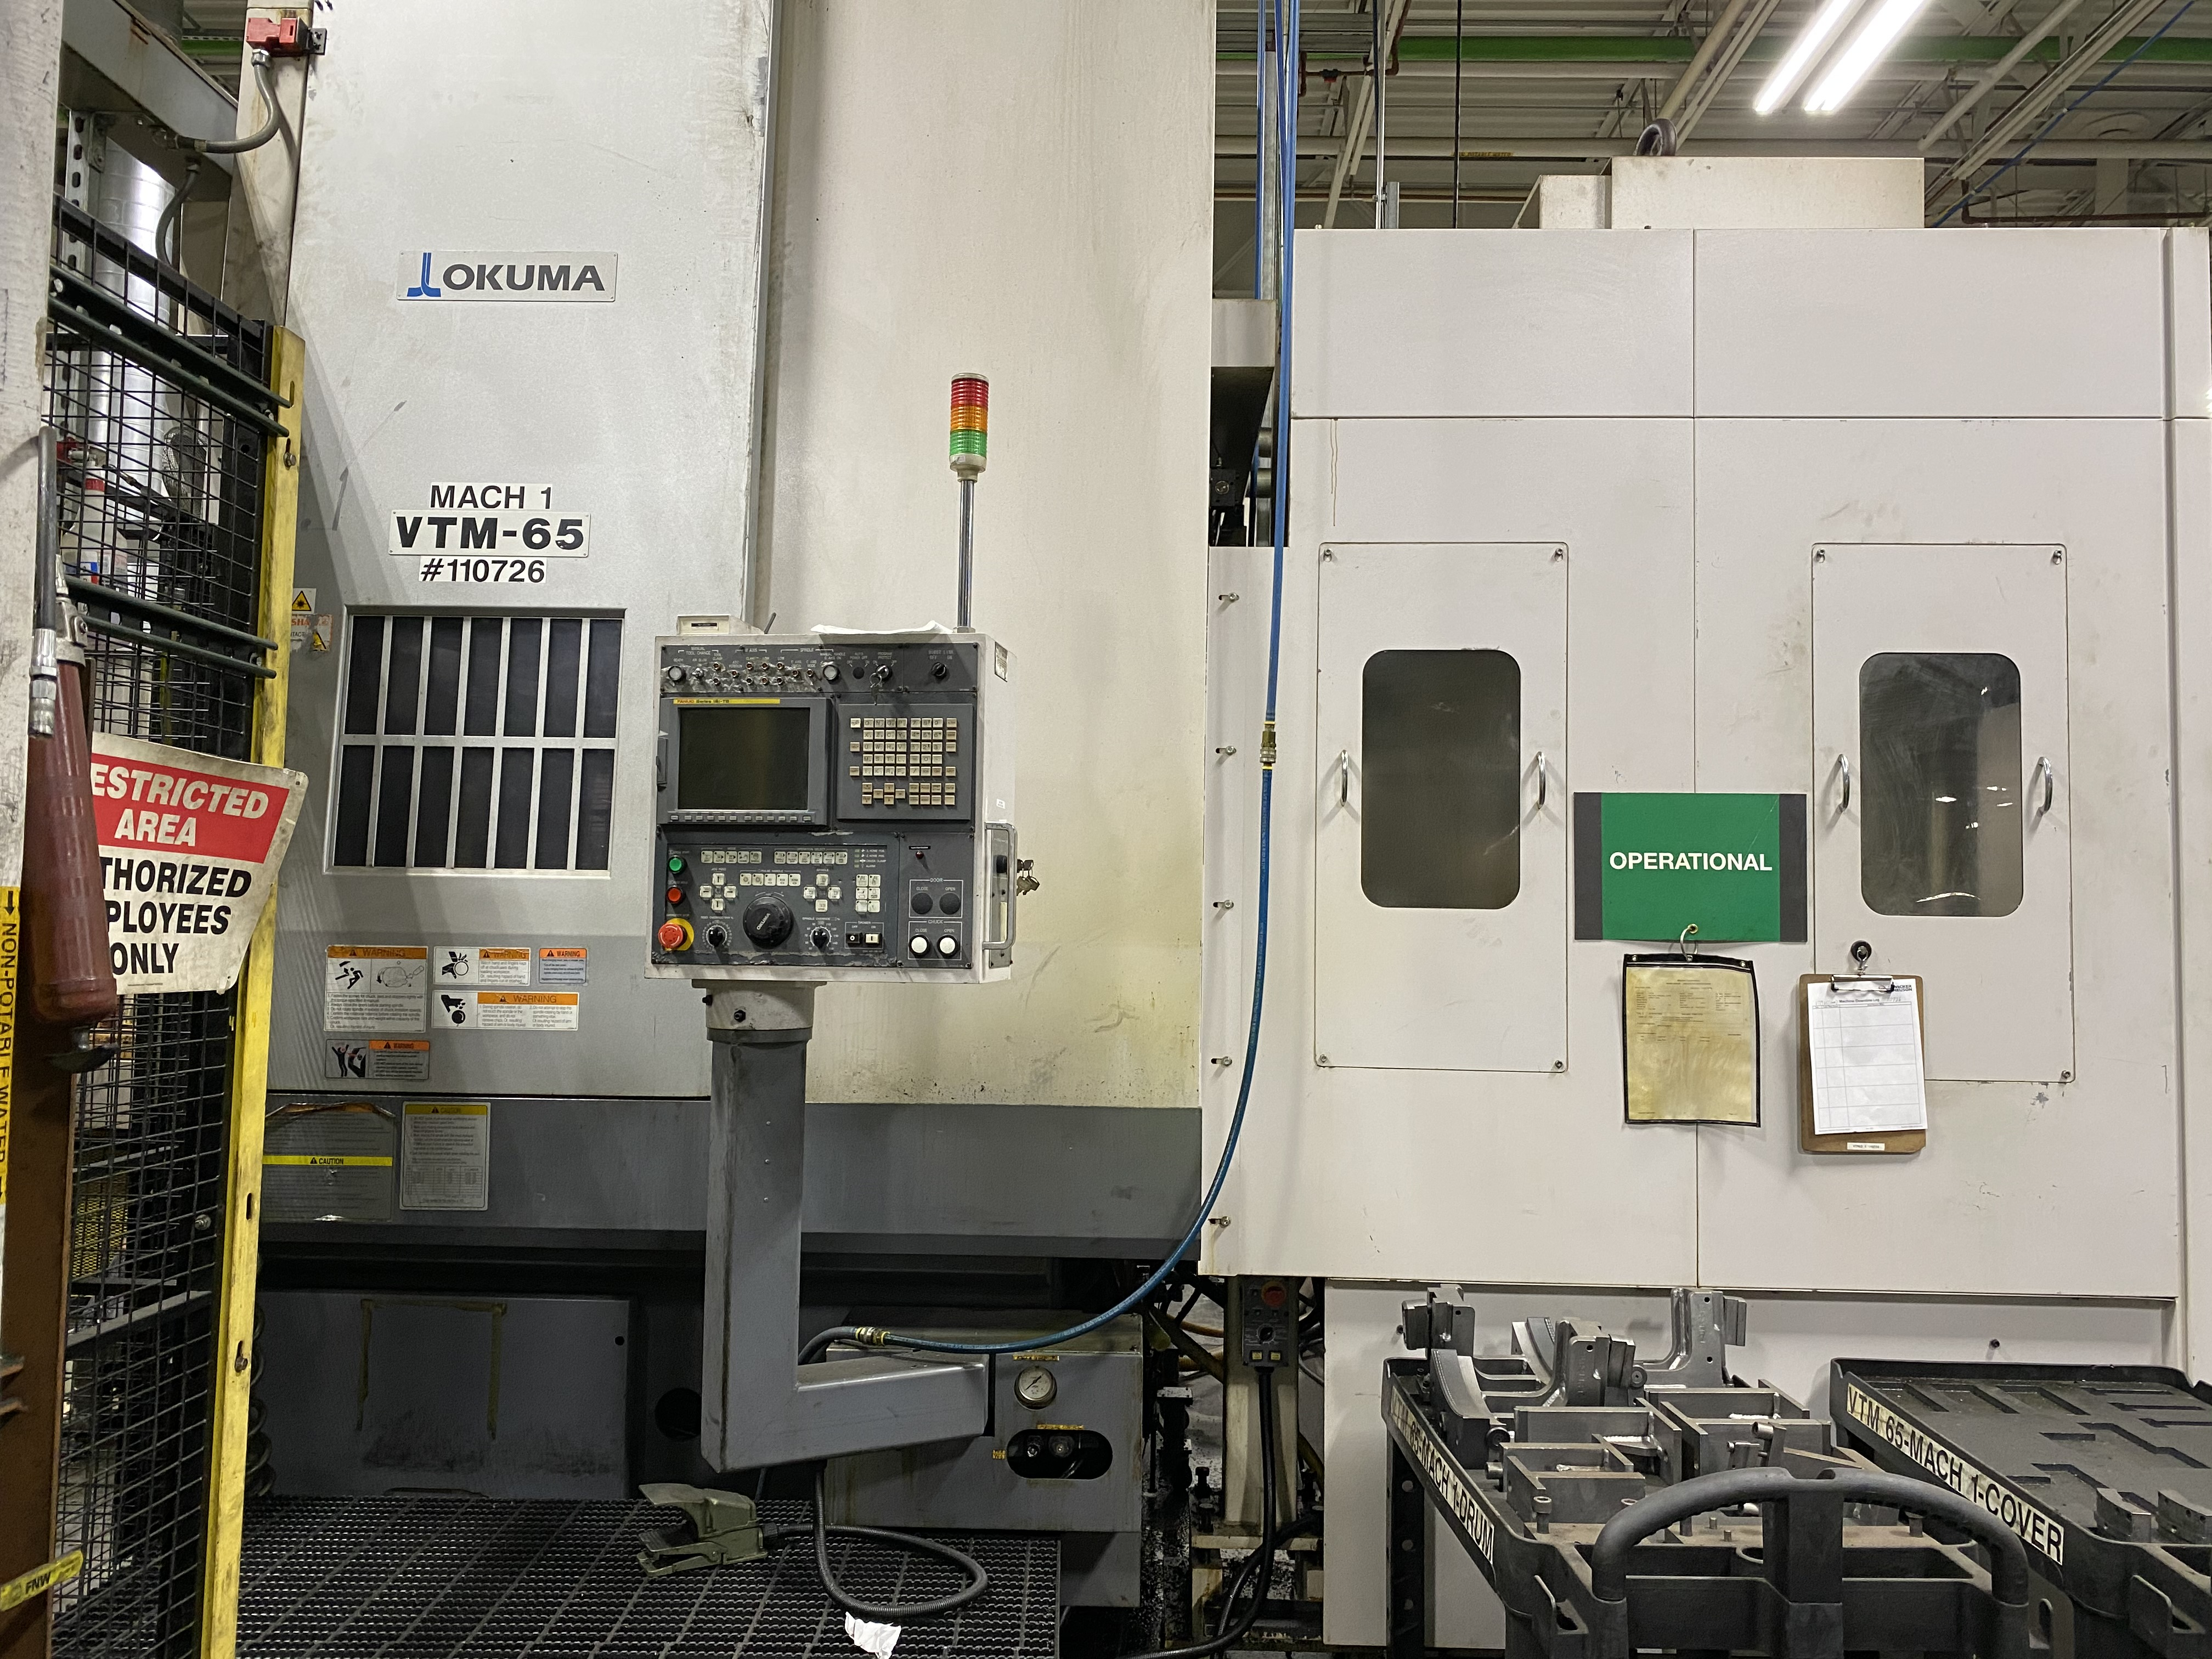 Okuma VTM-65 CNC Vertical Turning Centers